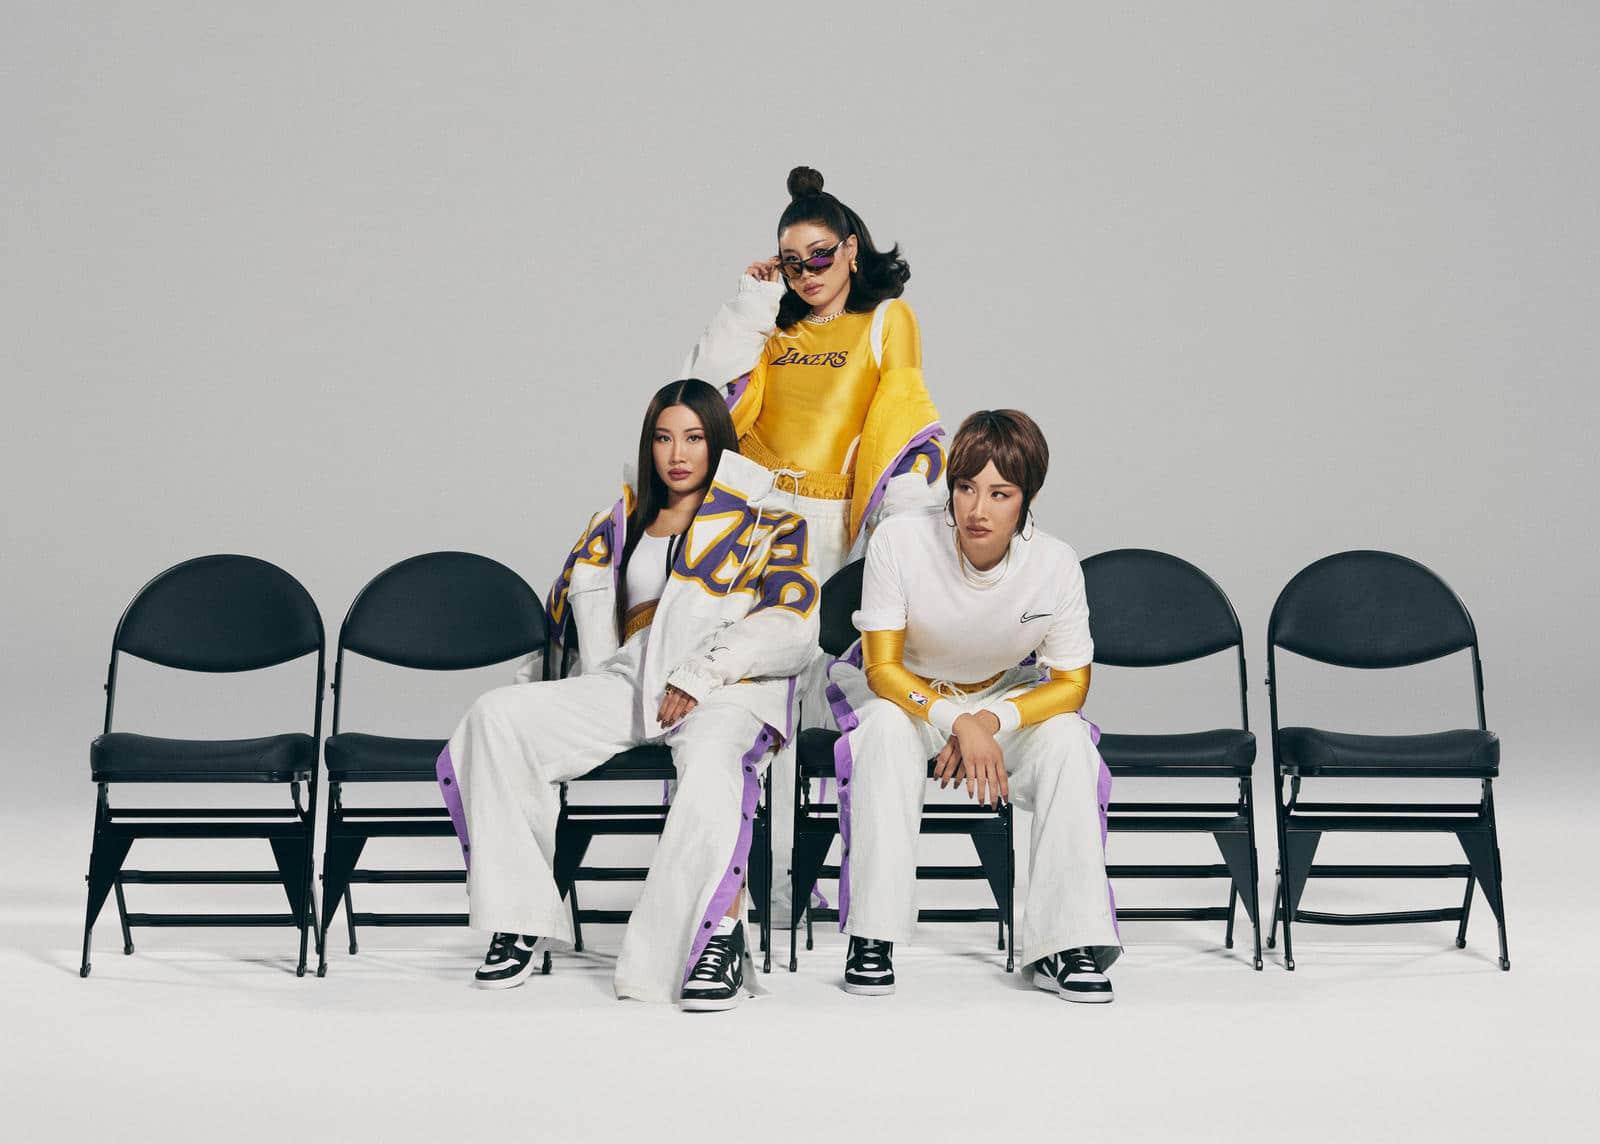 Одежда Lakers